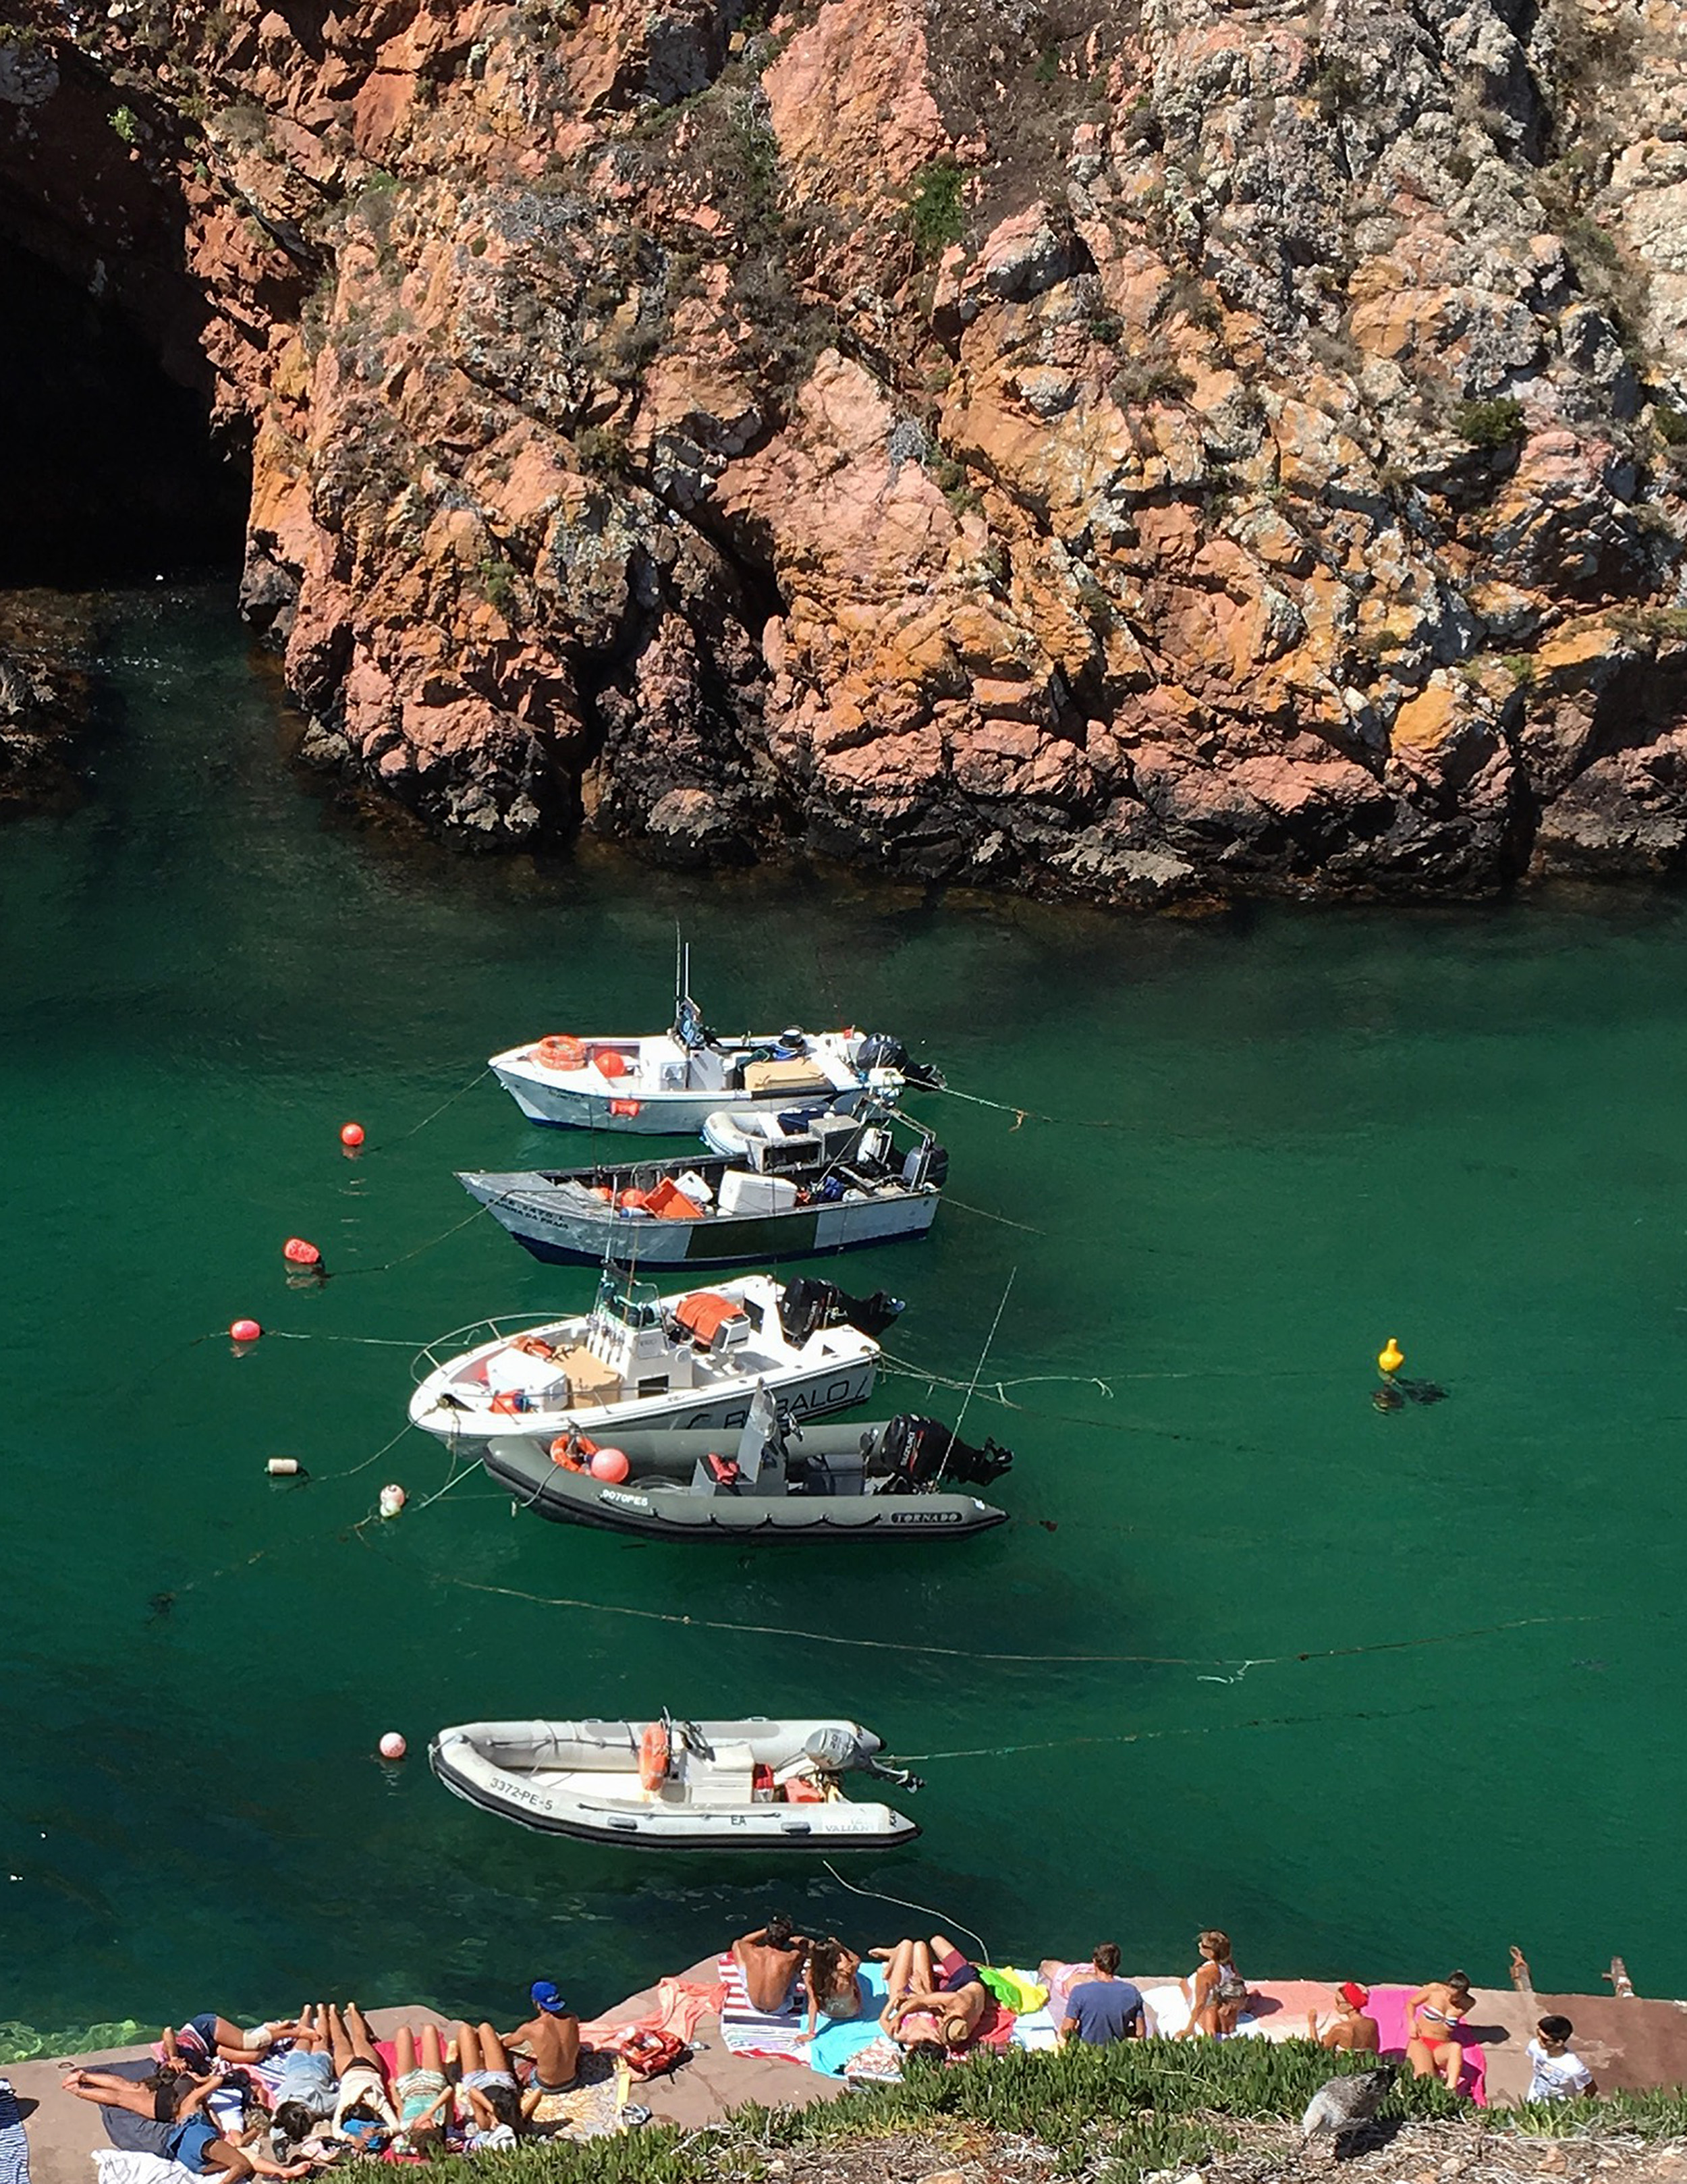 Barcos berlengas